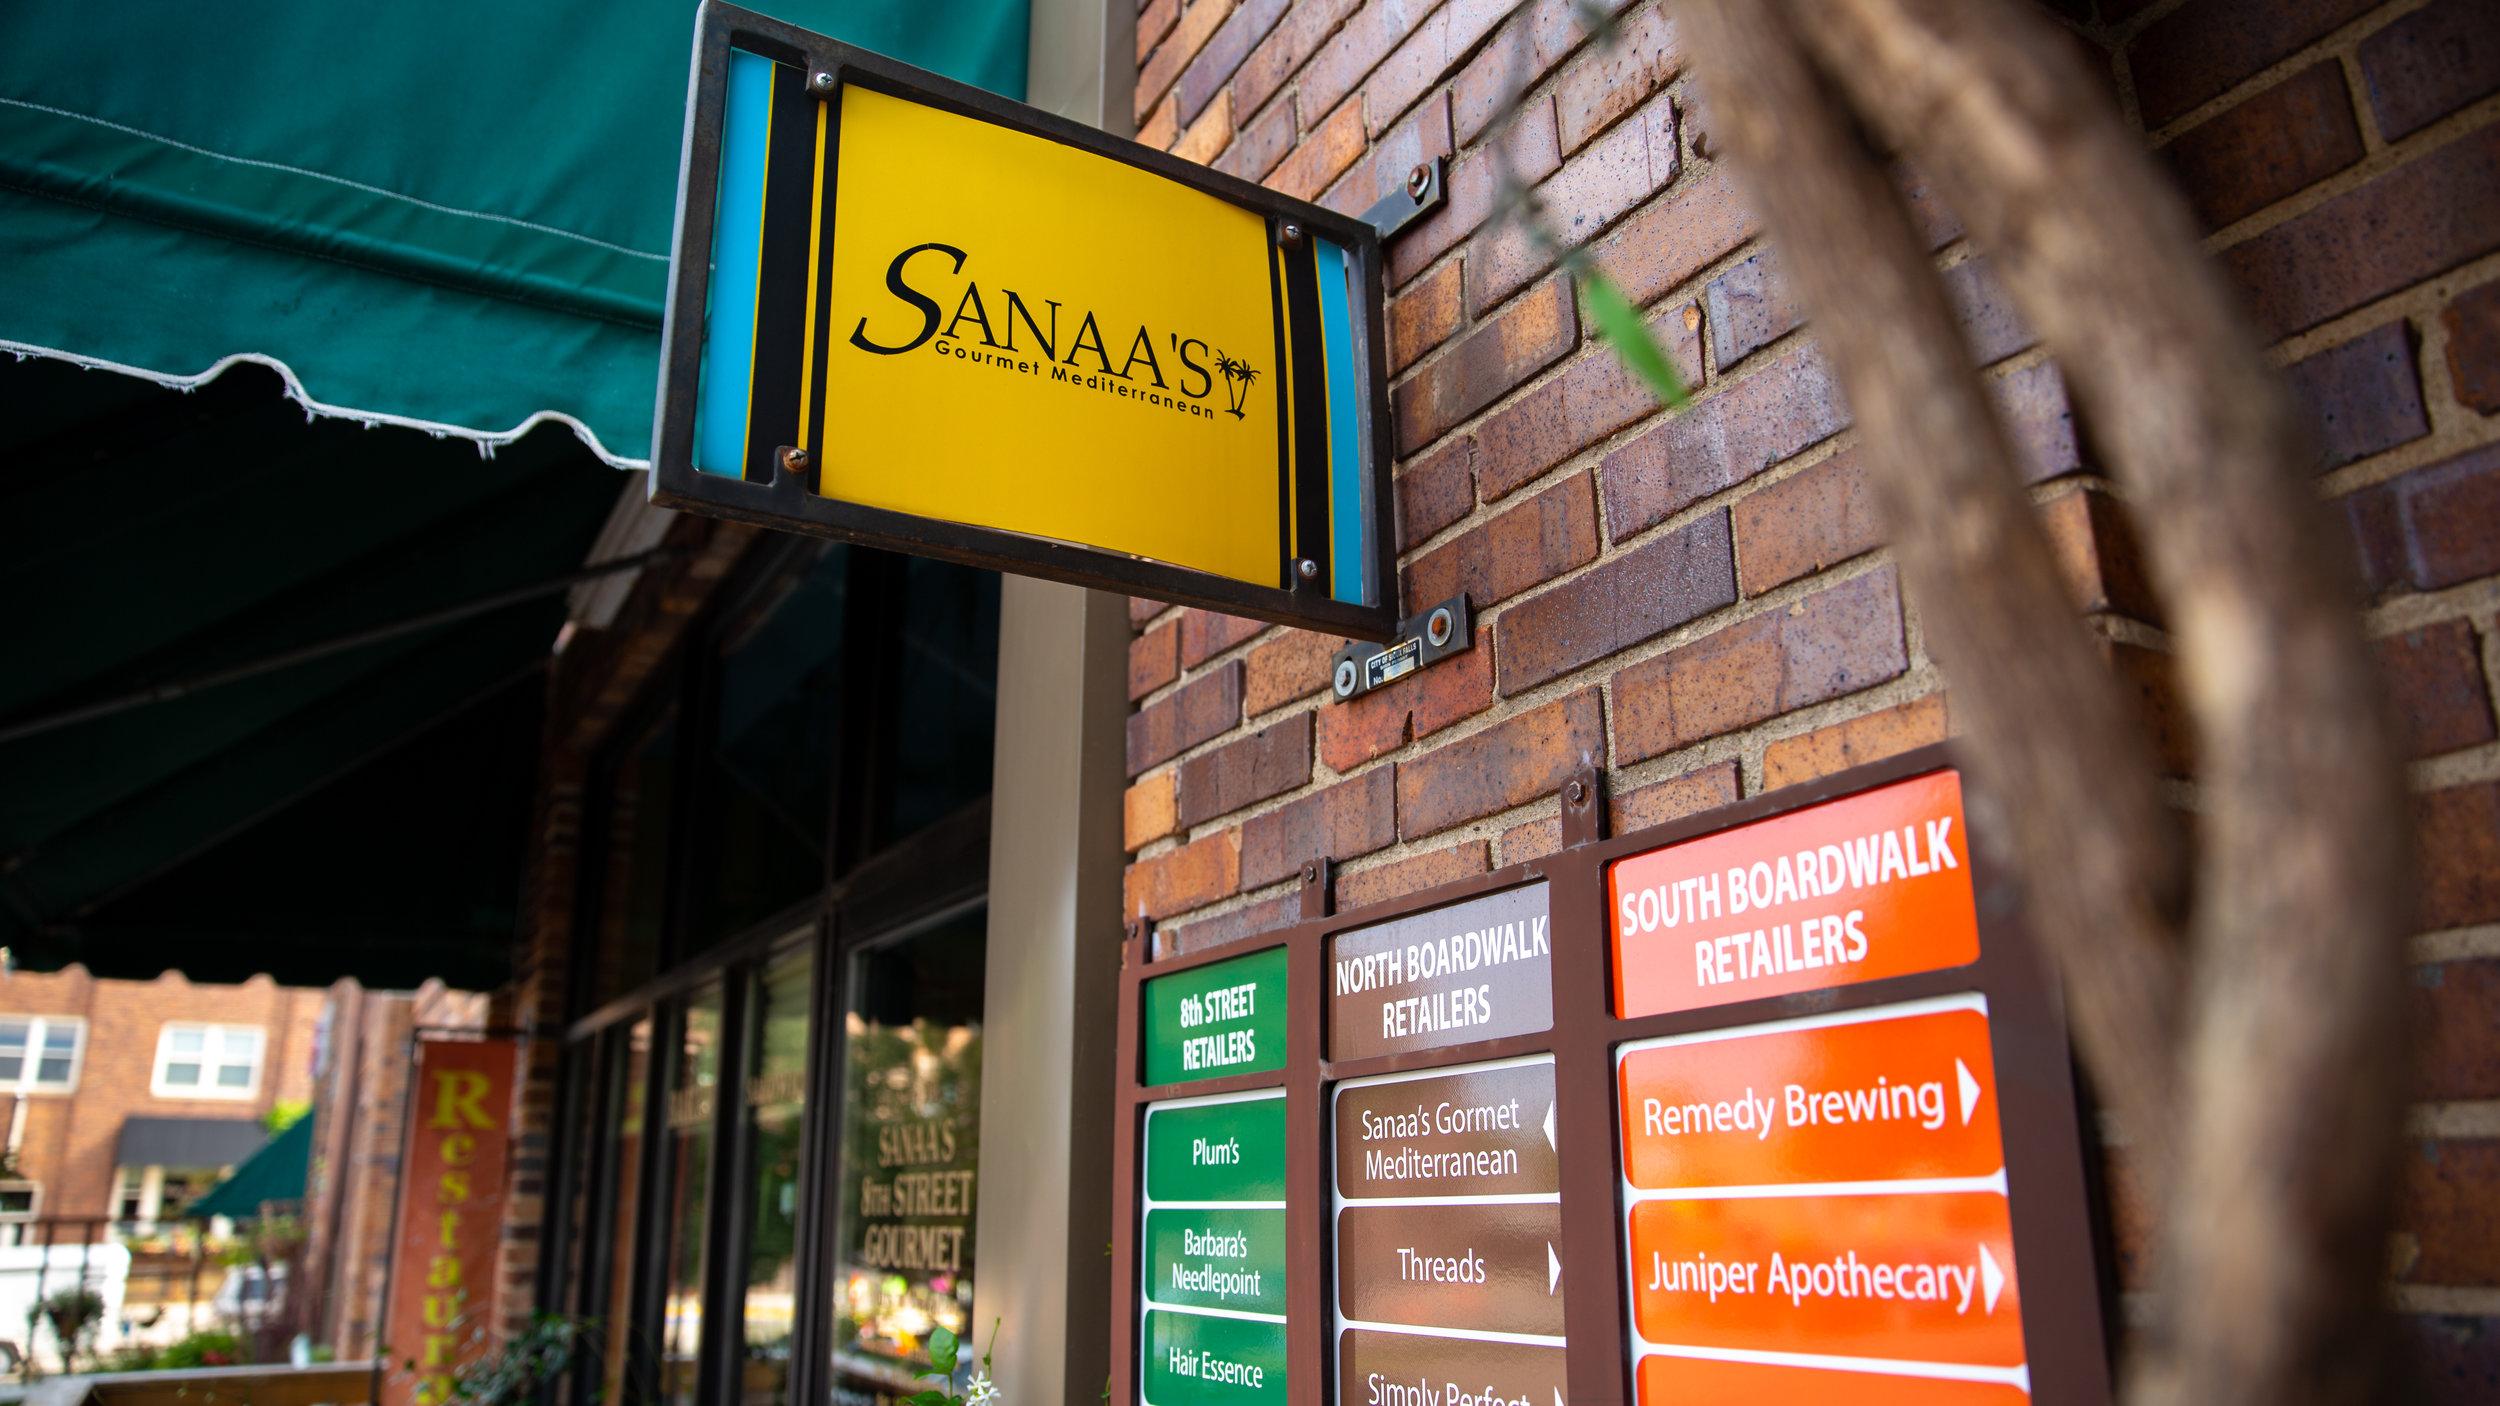 Sanaa's-4.jpg